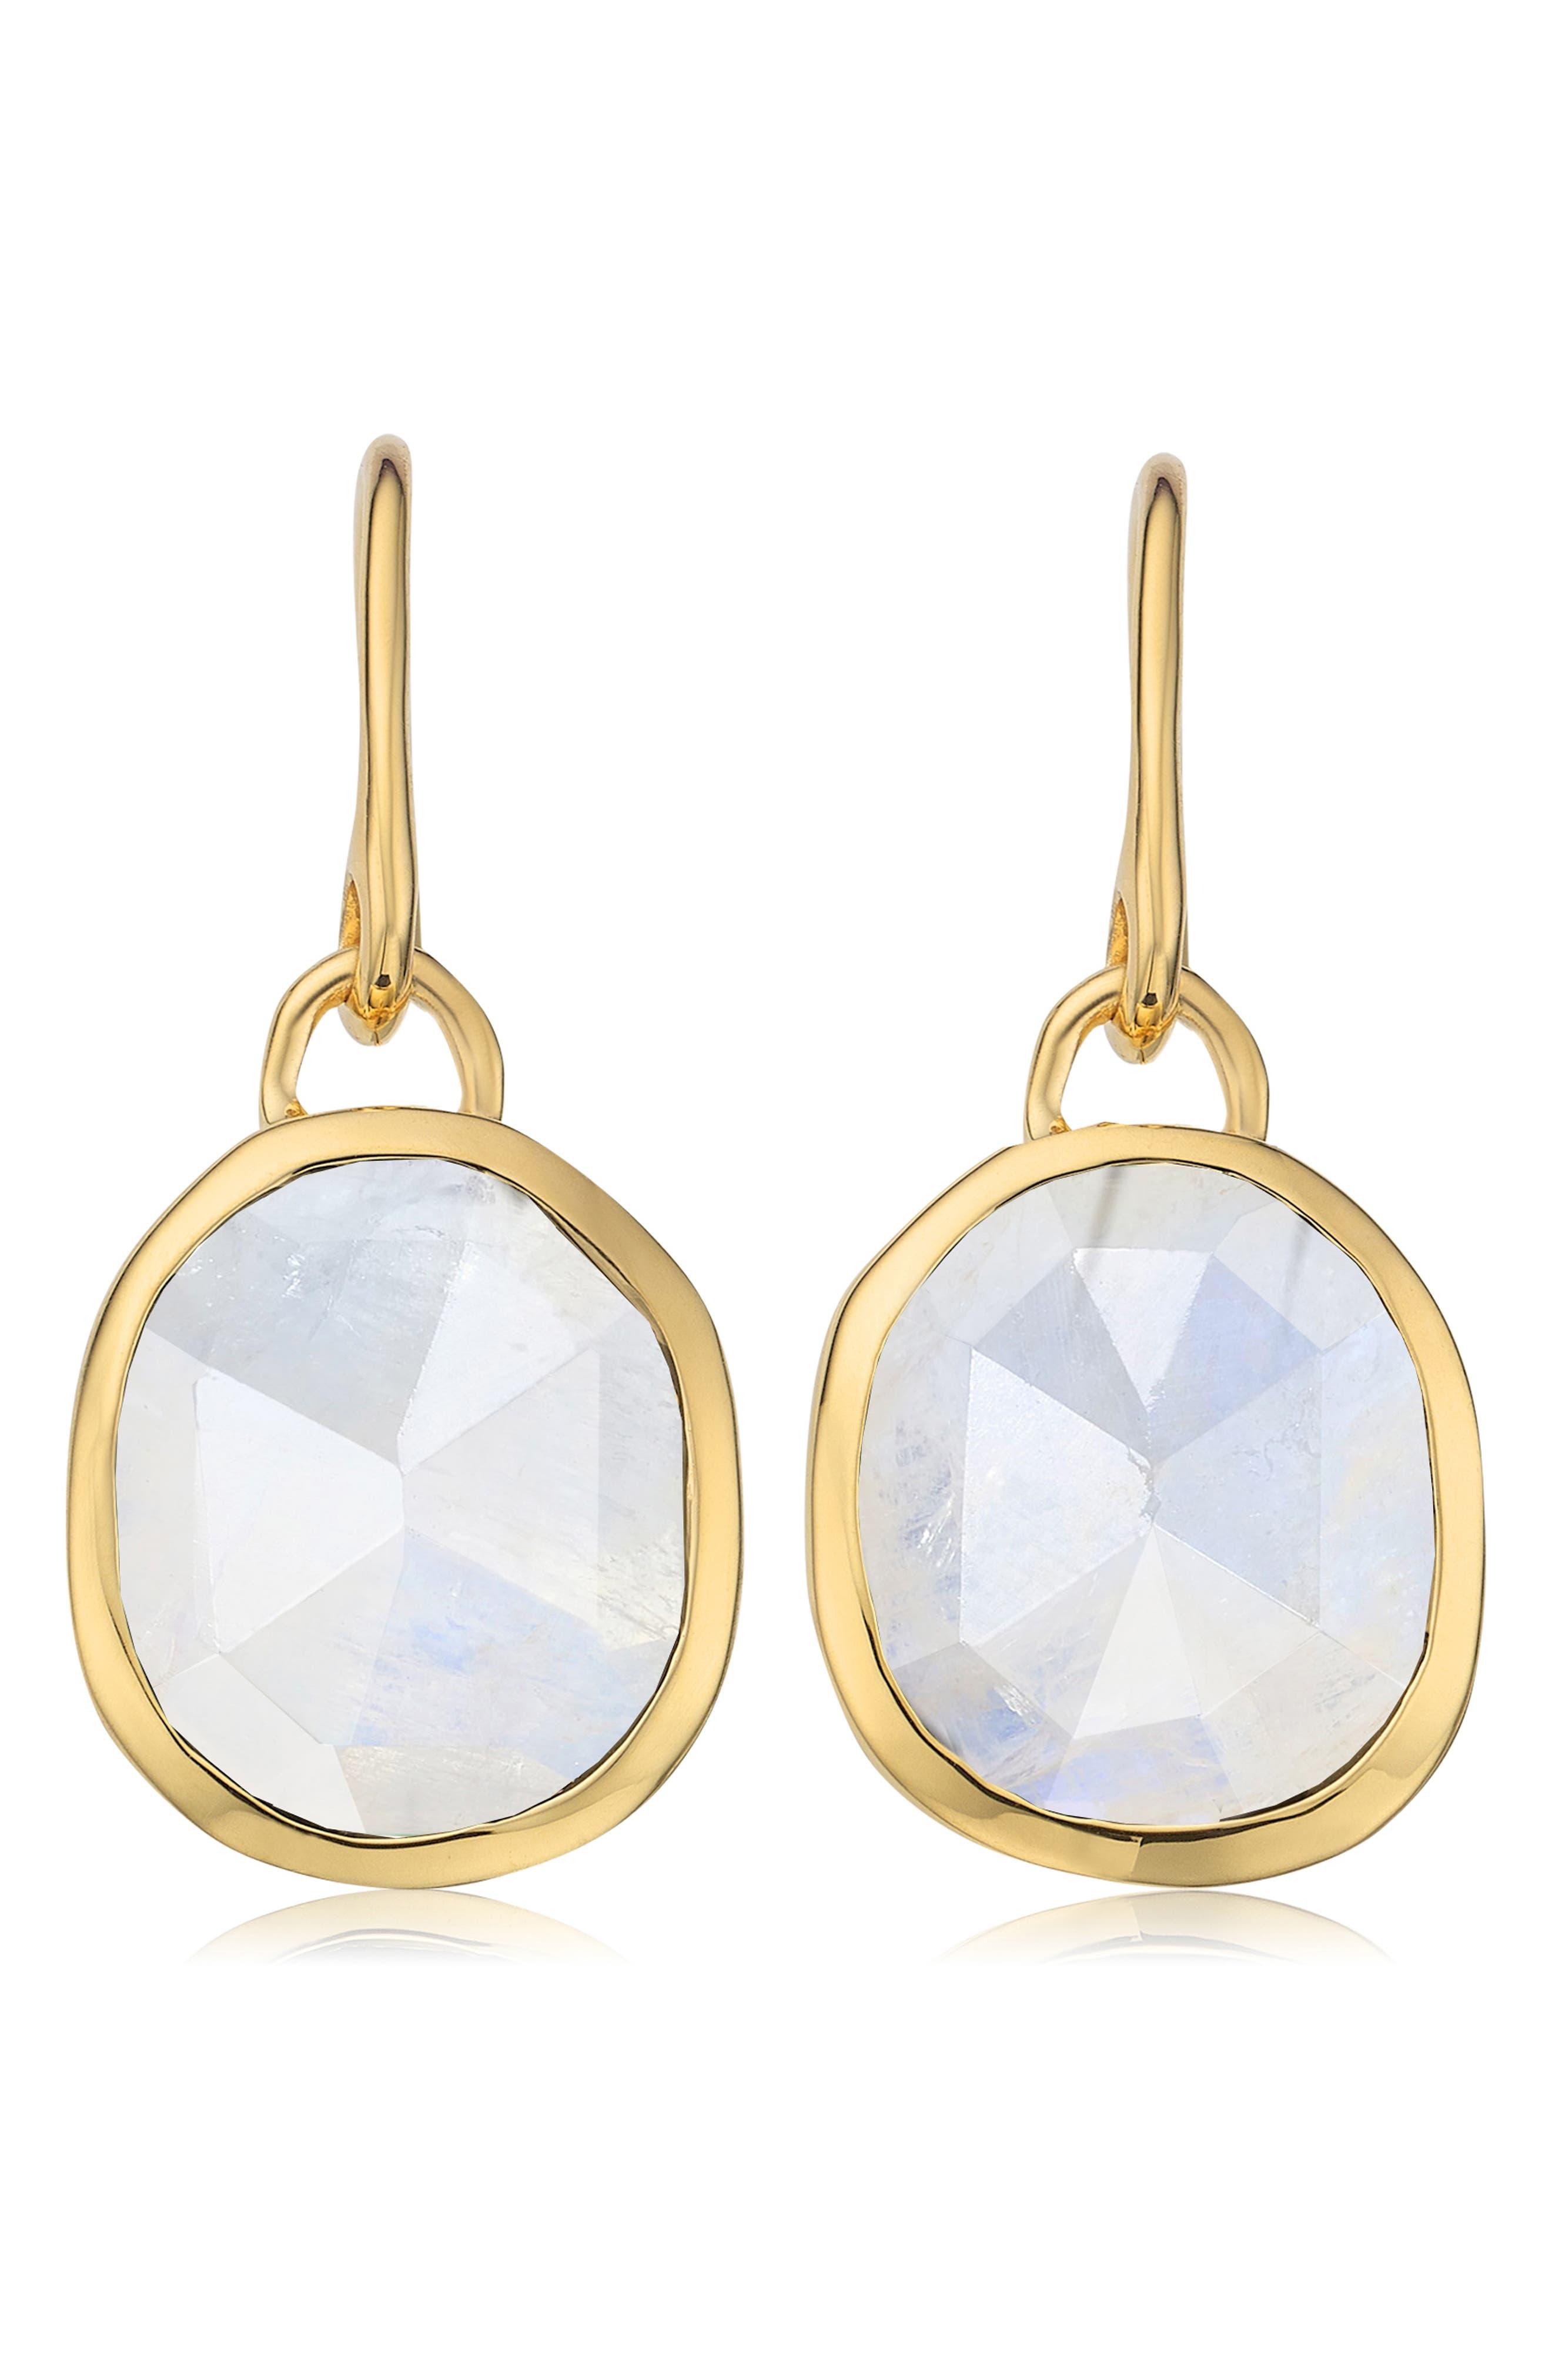 Siren Bezel Set Onyx Earrings,                             Main thumbnail 1, color,                             GOLD/ MOONSTONE